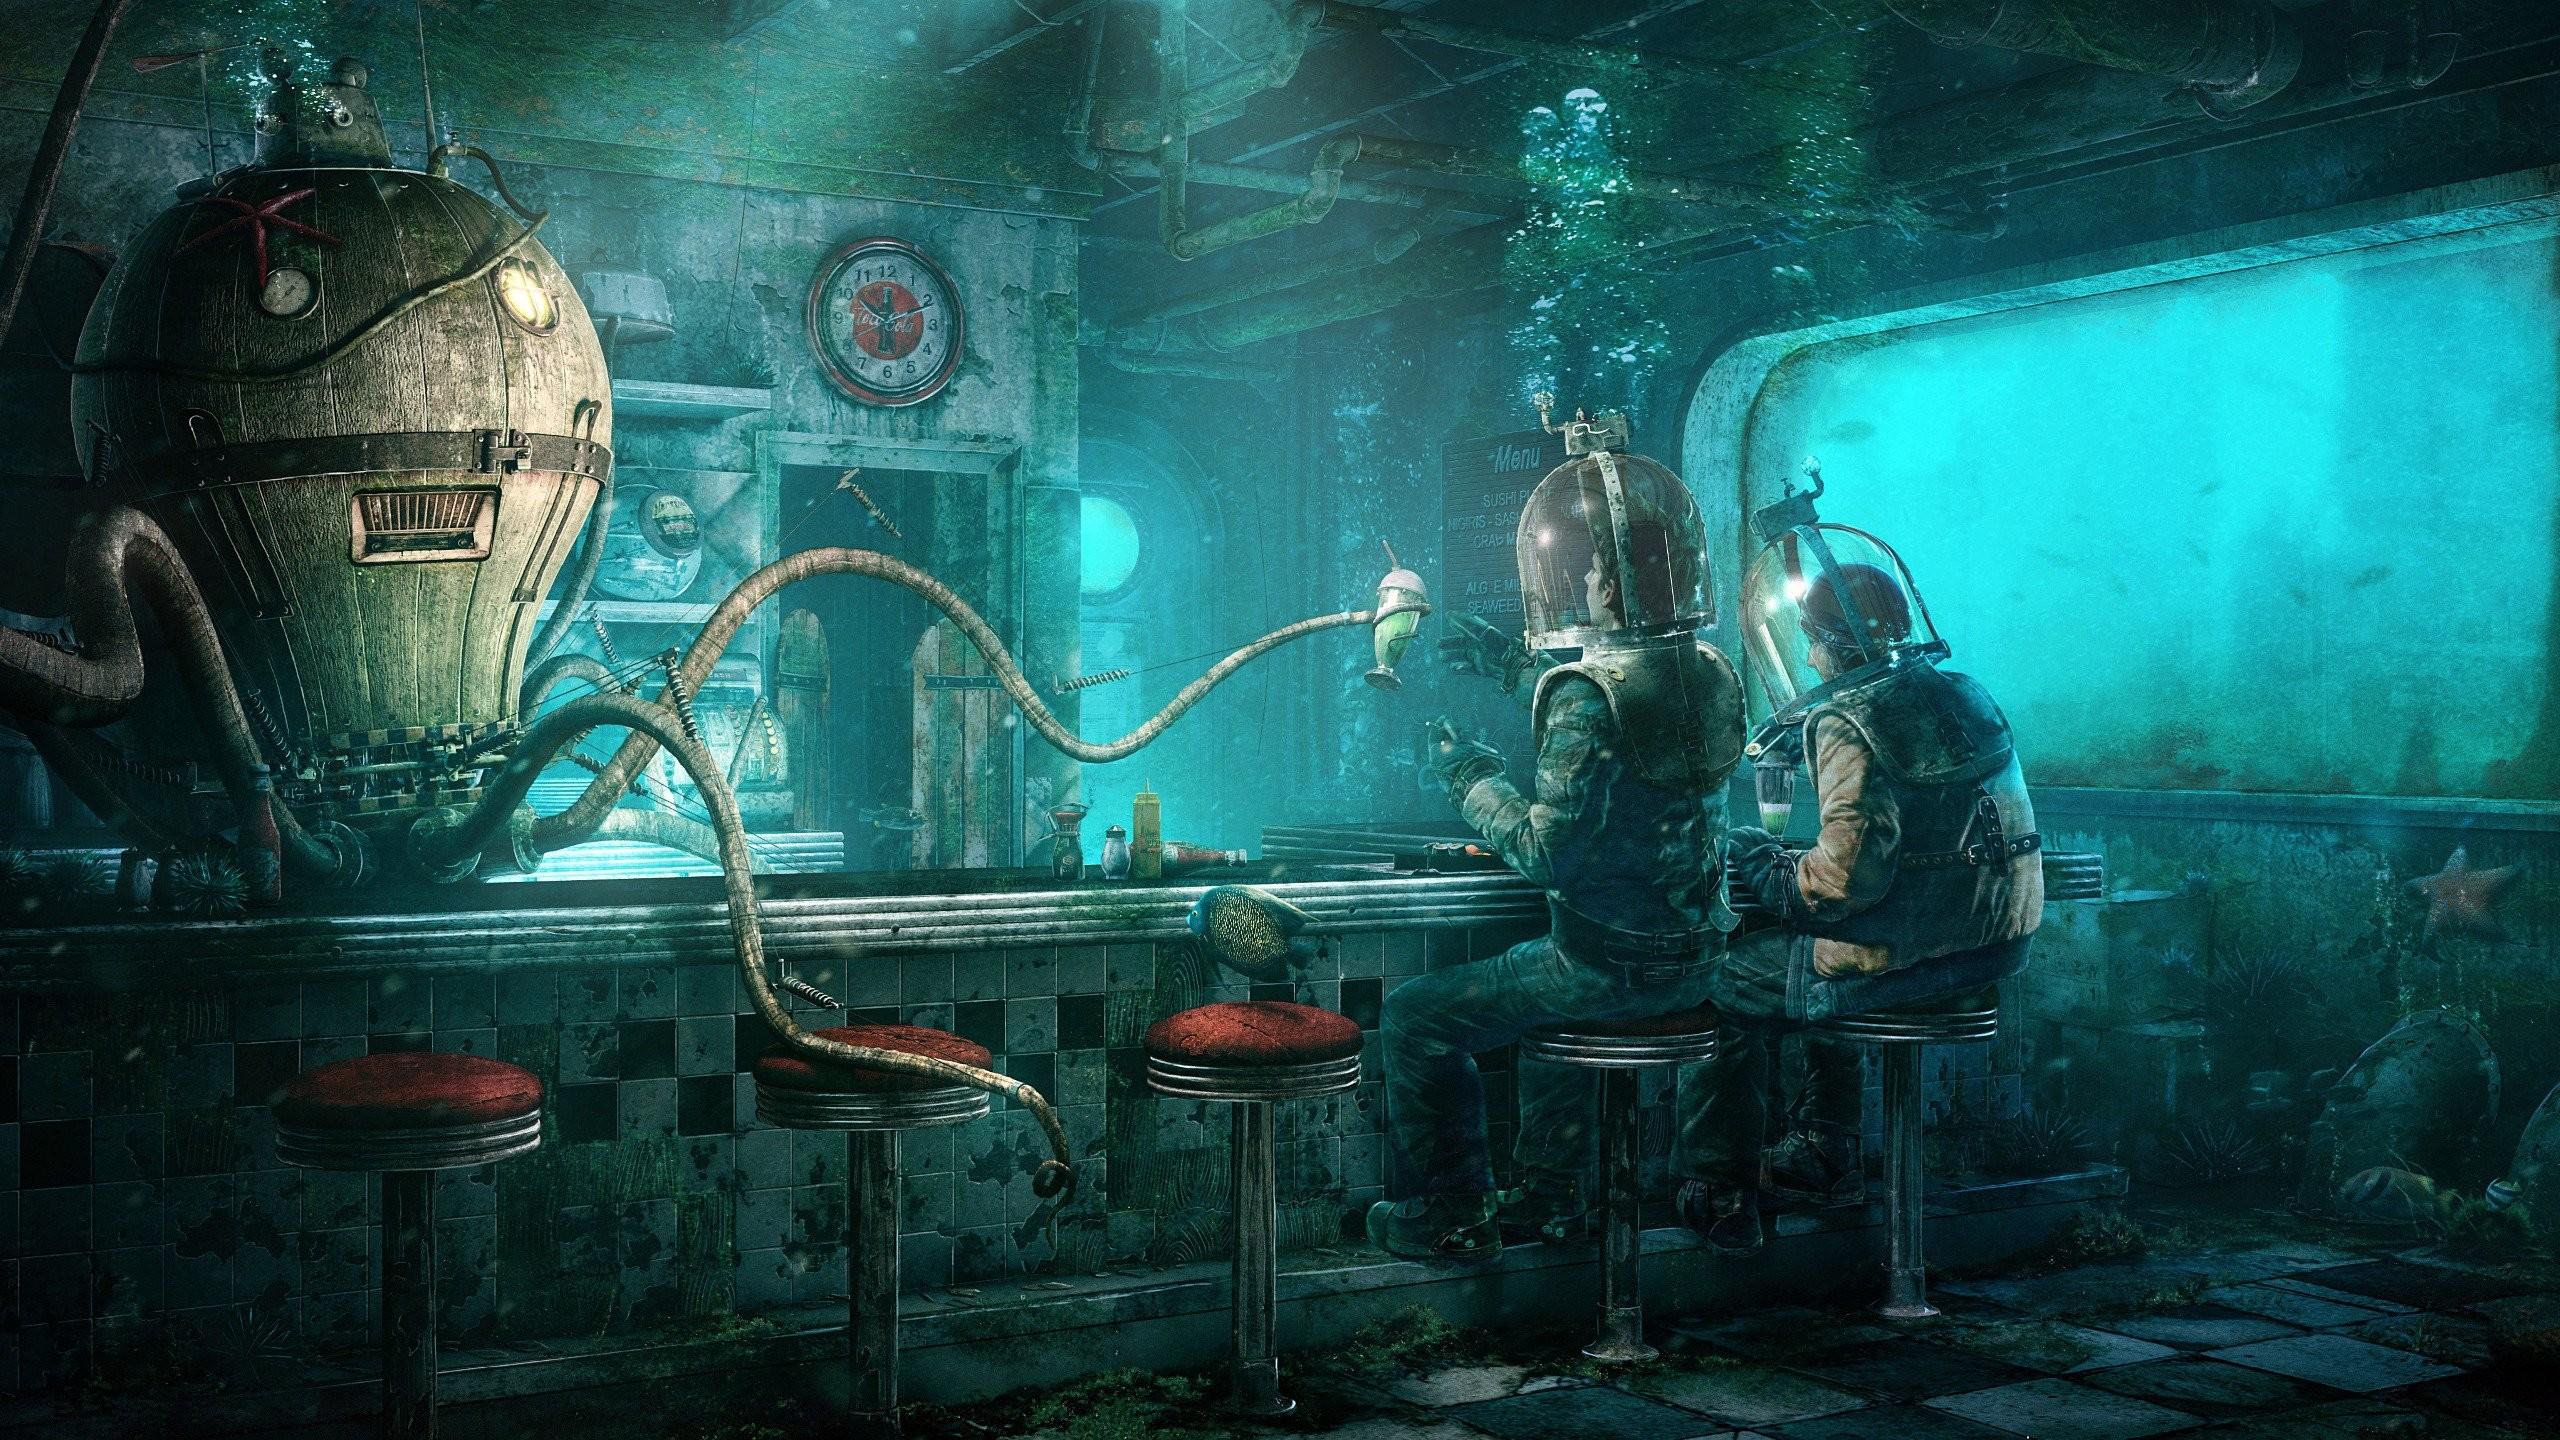 [47+] Retro Sci Fi Wallpaper on WallpaperSafari